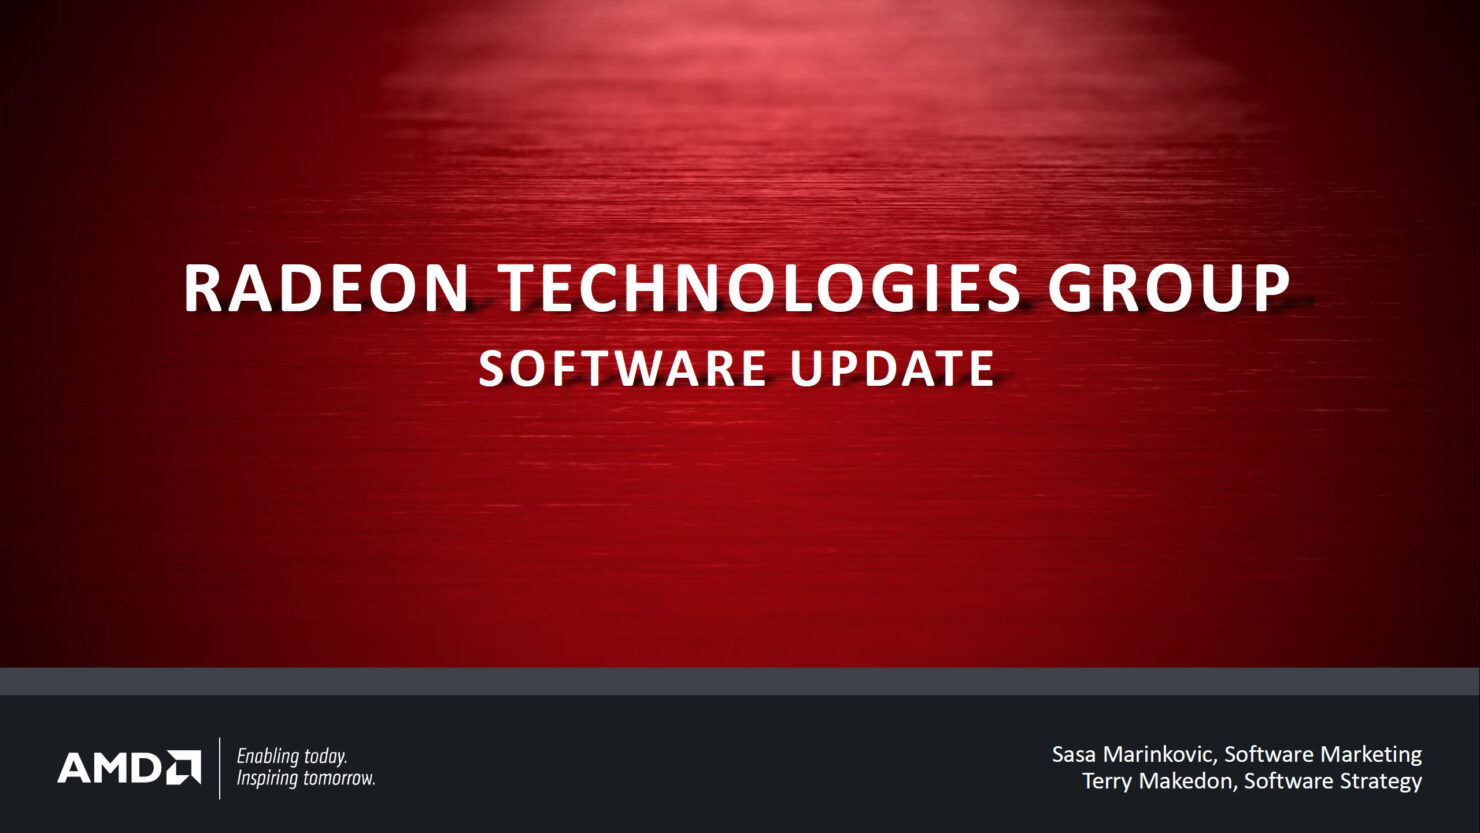 amd-radeon_crimson-driver_radeon-technologies